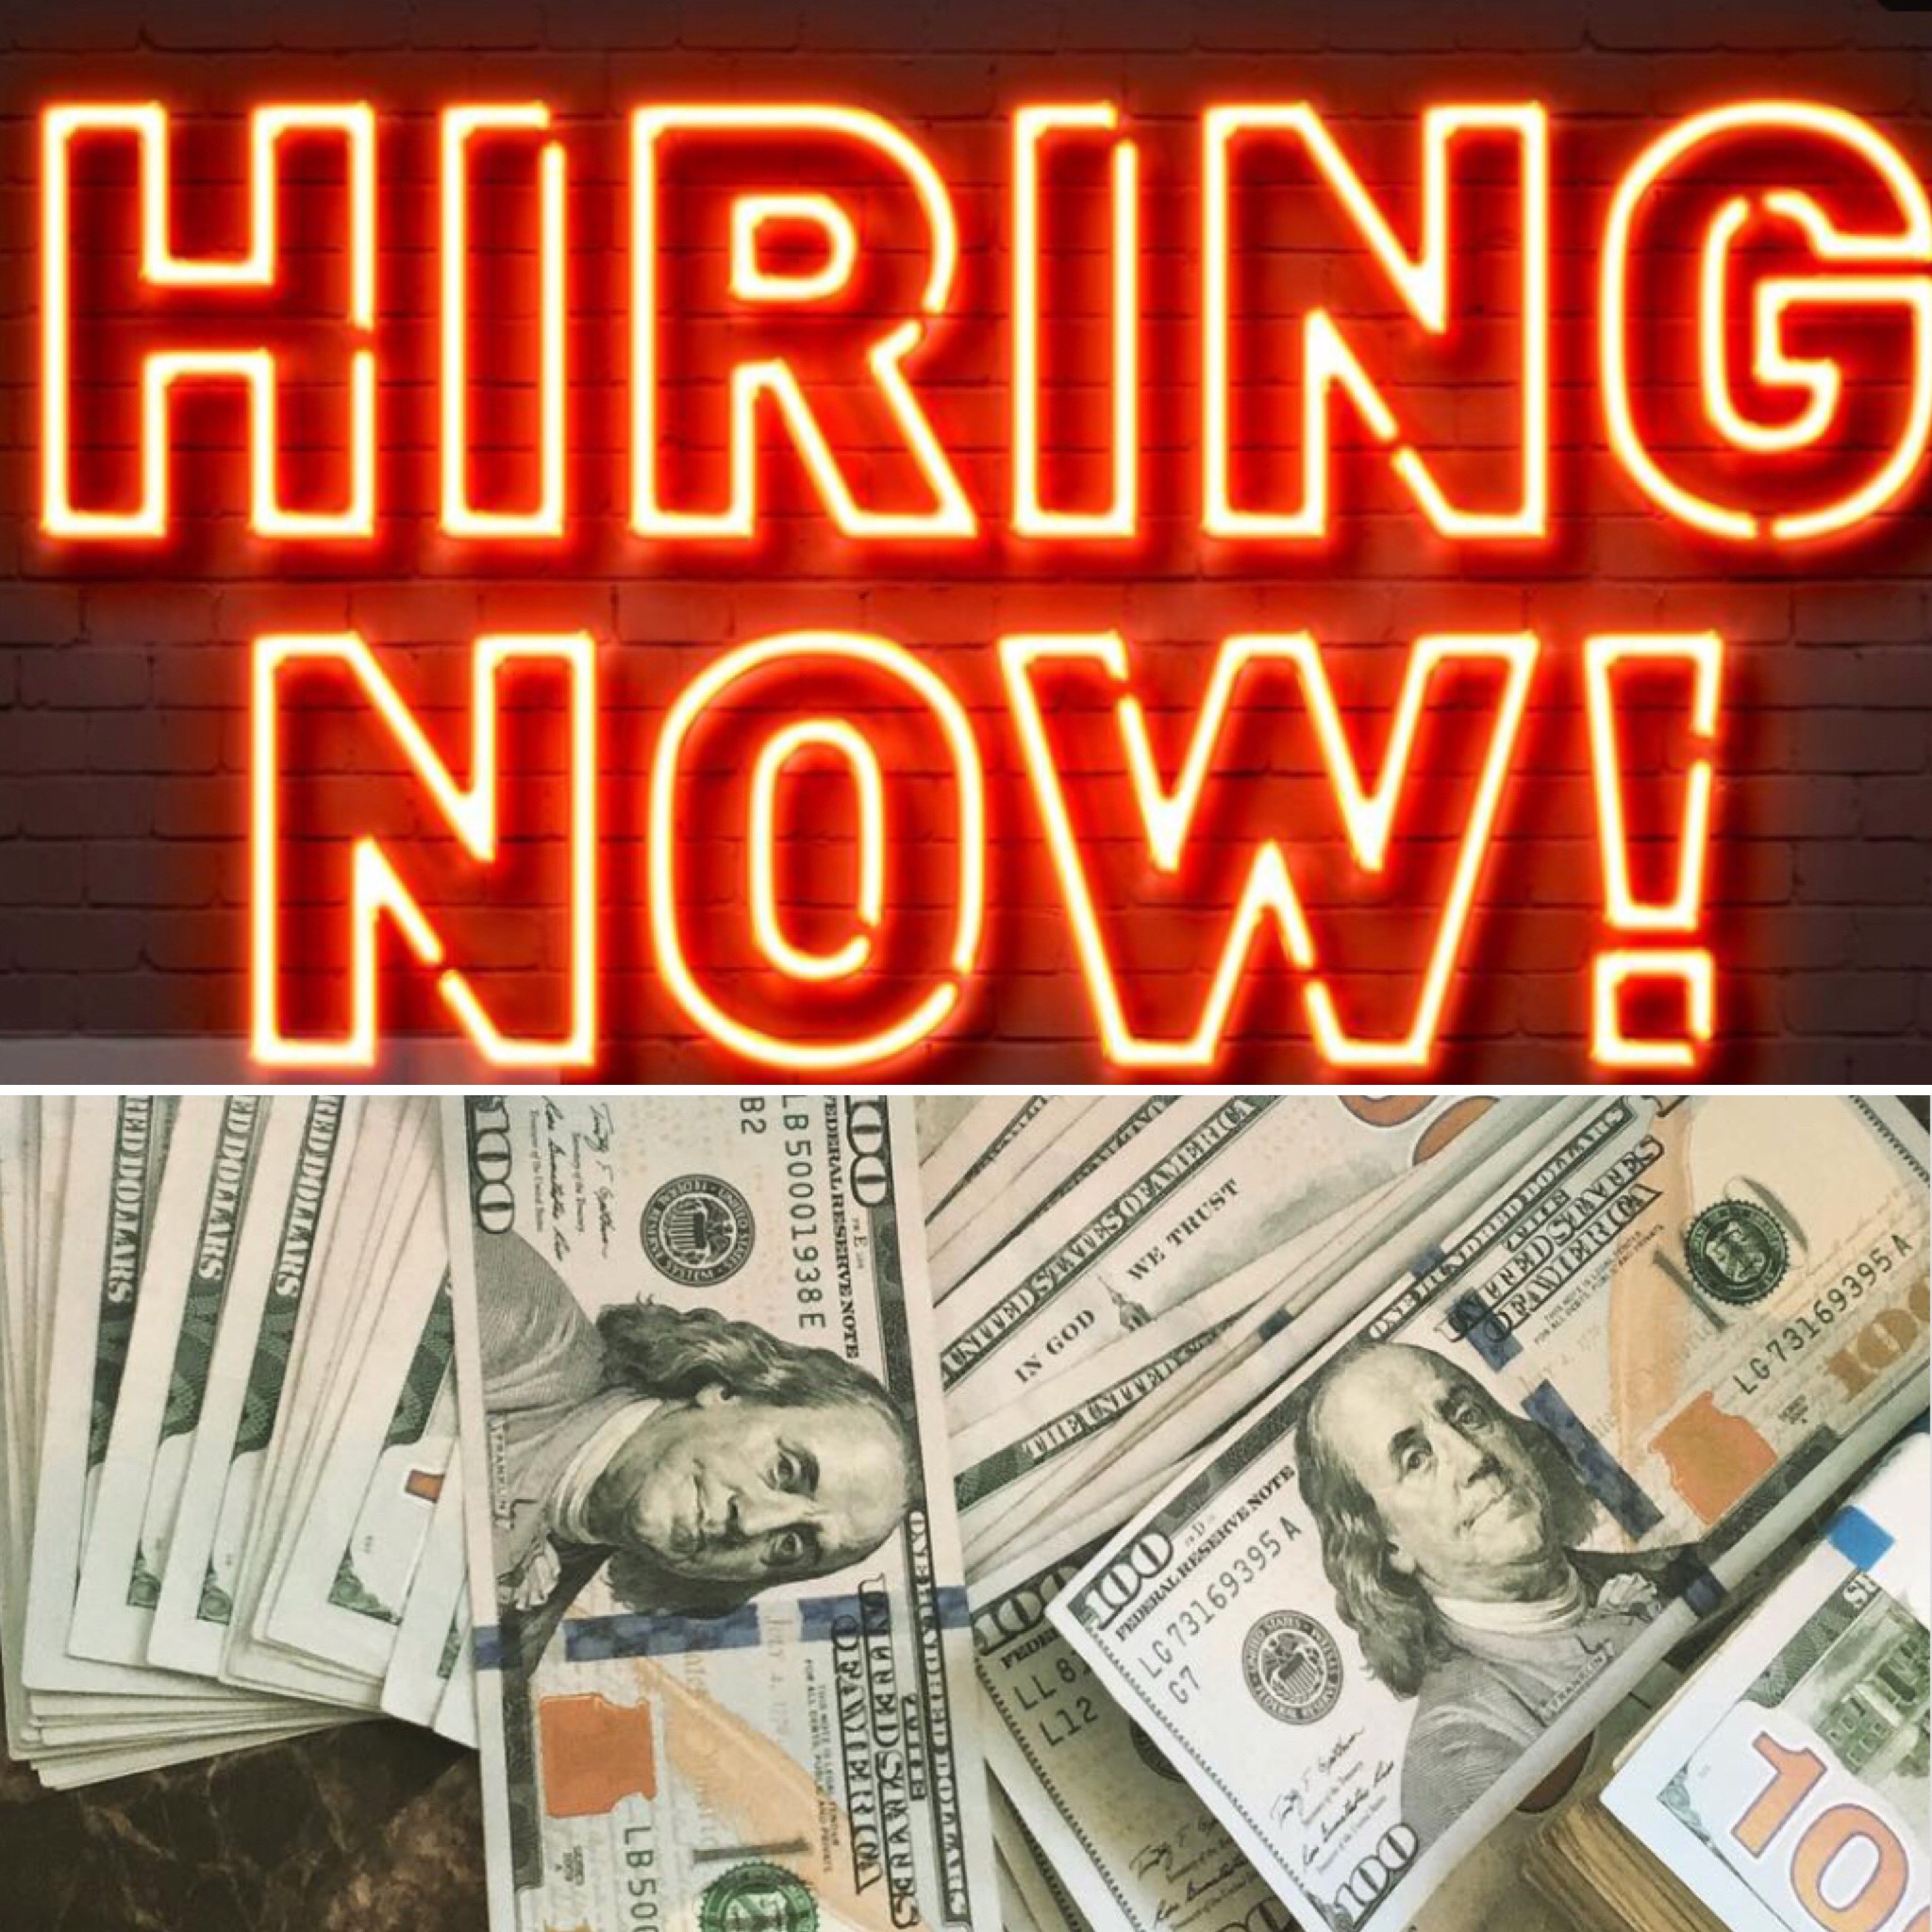 TORONTO'S_MOST_CONVENIENT_BUSY_ LOCATION_ESTABLISHED_UPSCALE_$500-$1000 CASH-PerShift